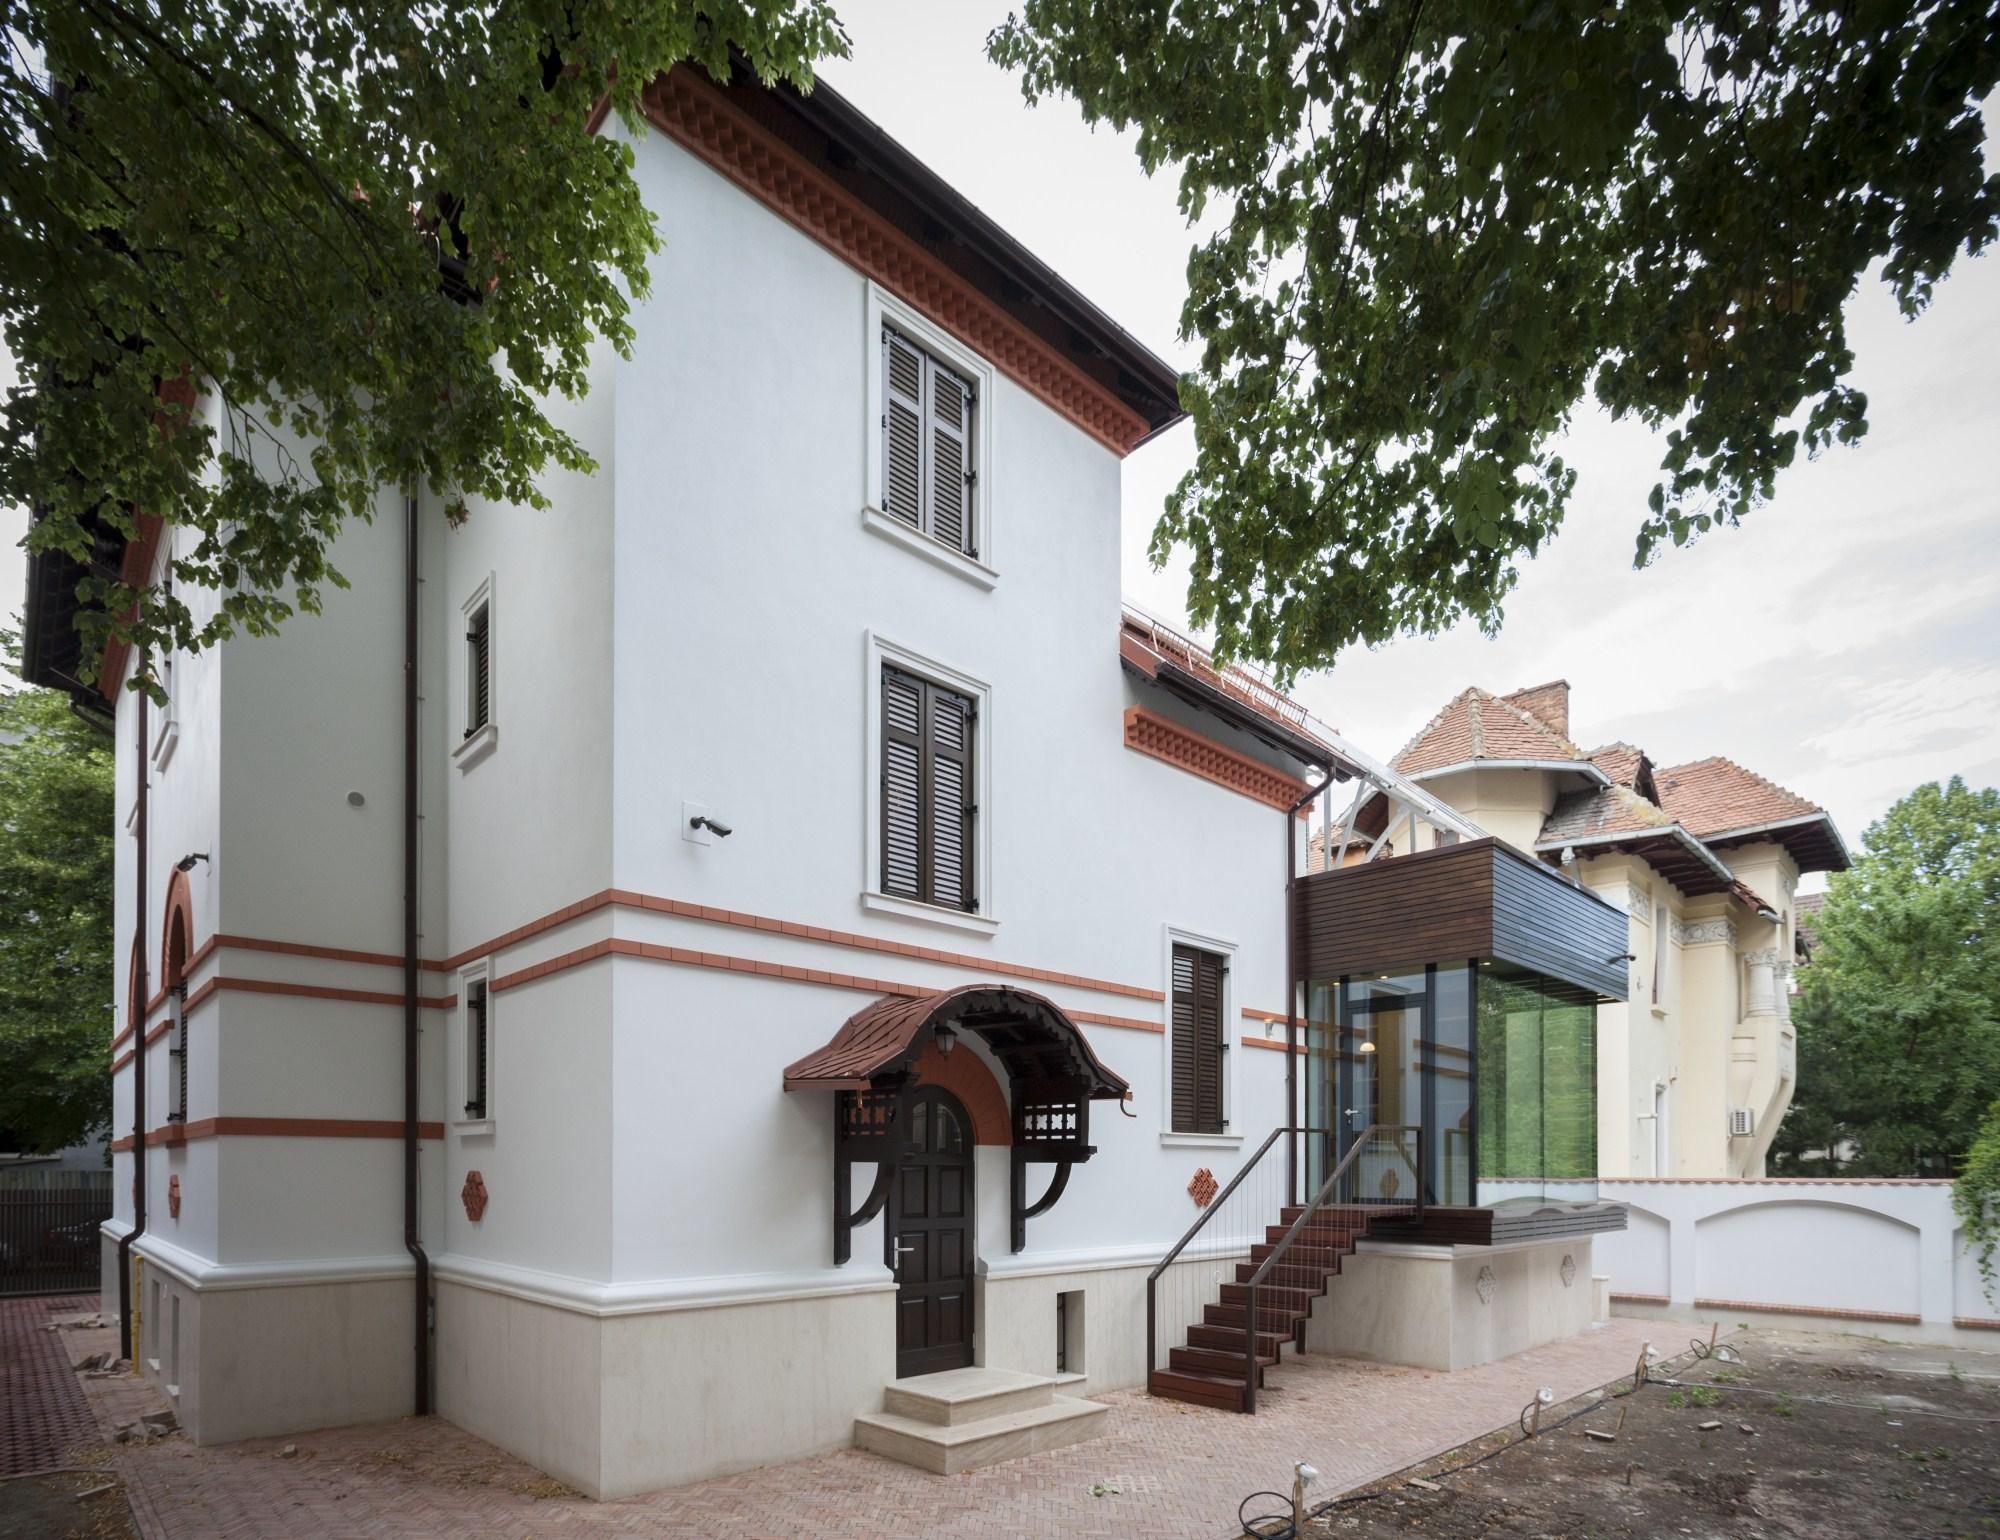 https://nbc-arhitect.ro/wp-content/uploads/2020/10/NBC-Arhitect-_-restorations-_-Washington-House-_-Bucharest-Romania_48.jpg